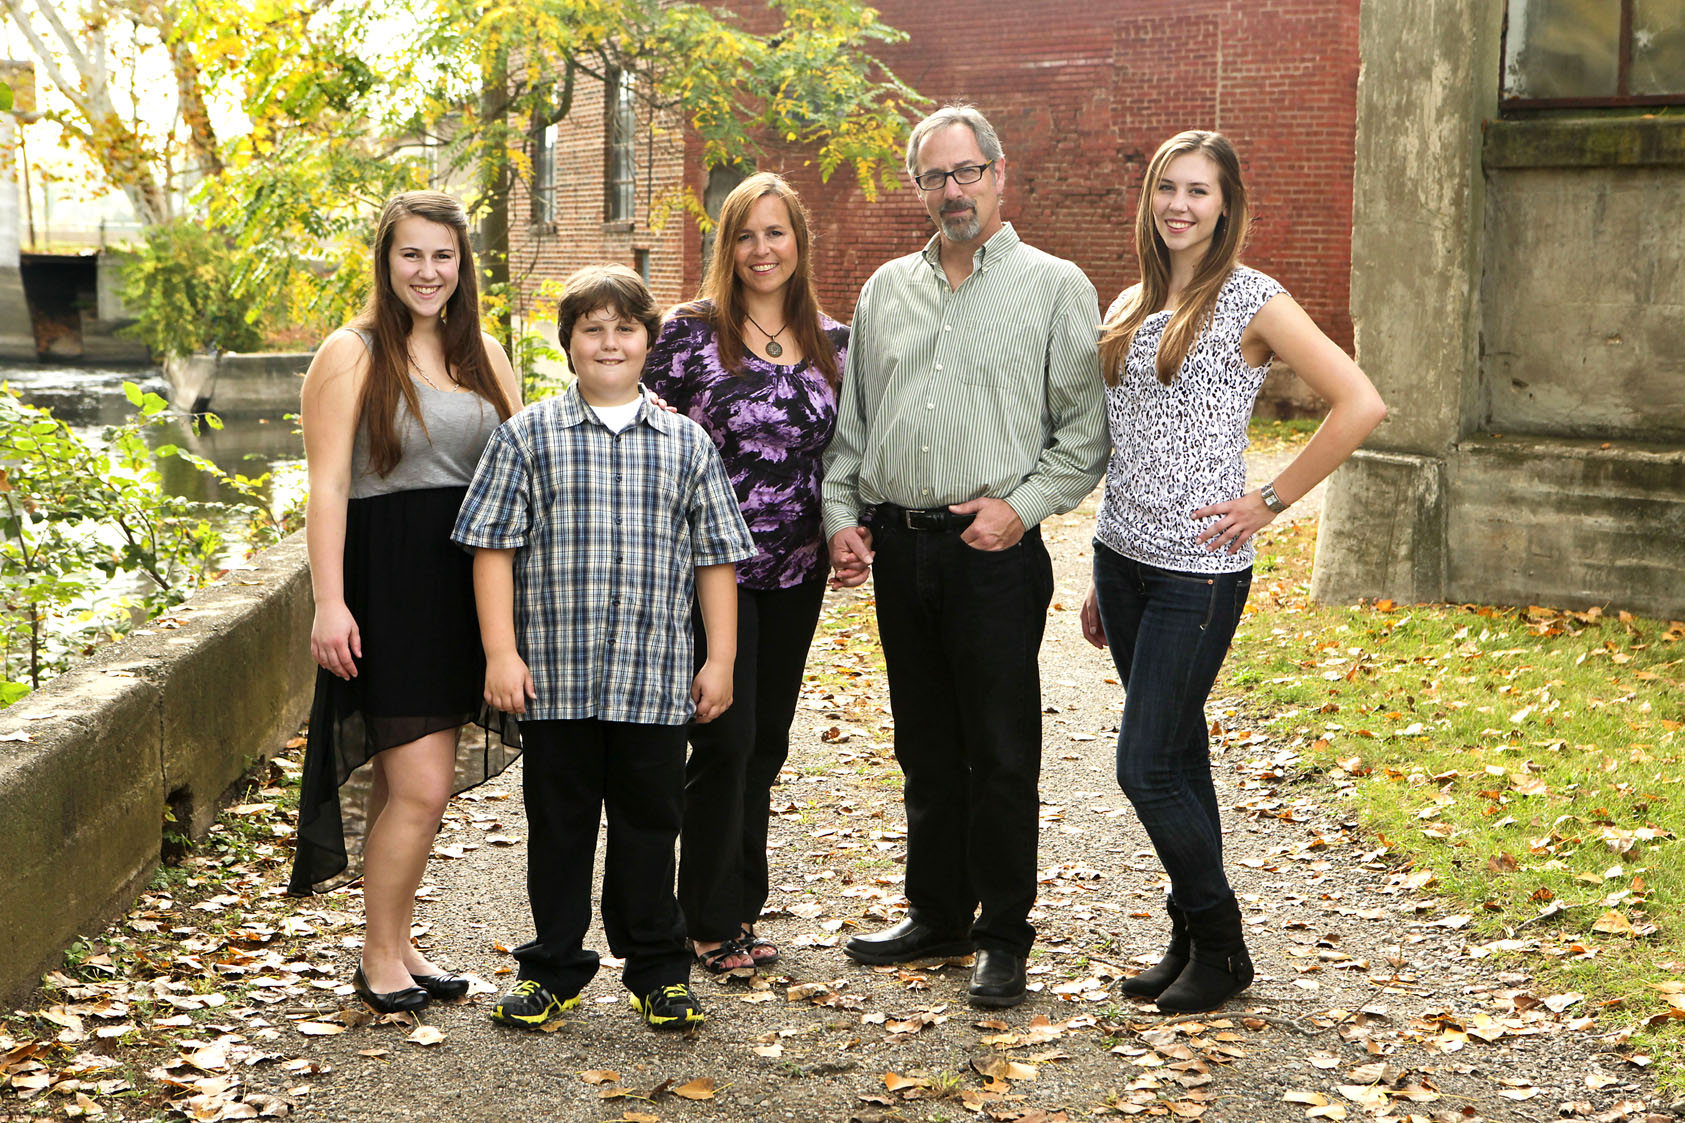 outdoorfamilyphotographernaturallightphotographersfamilyportraits.jpg